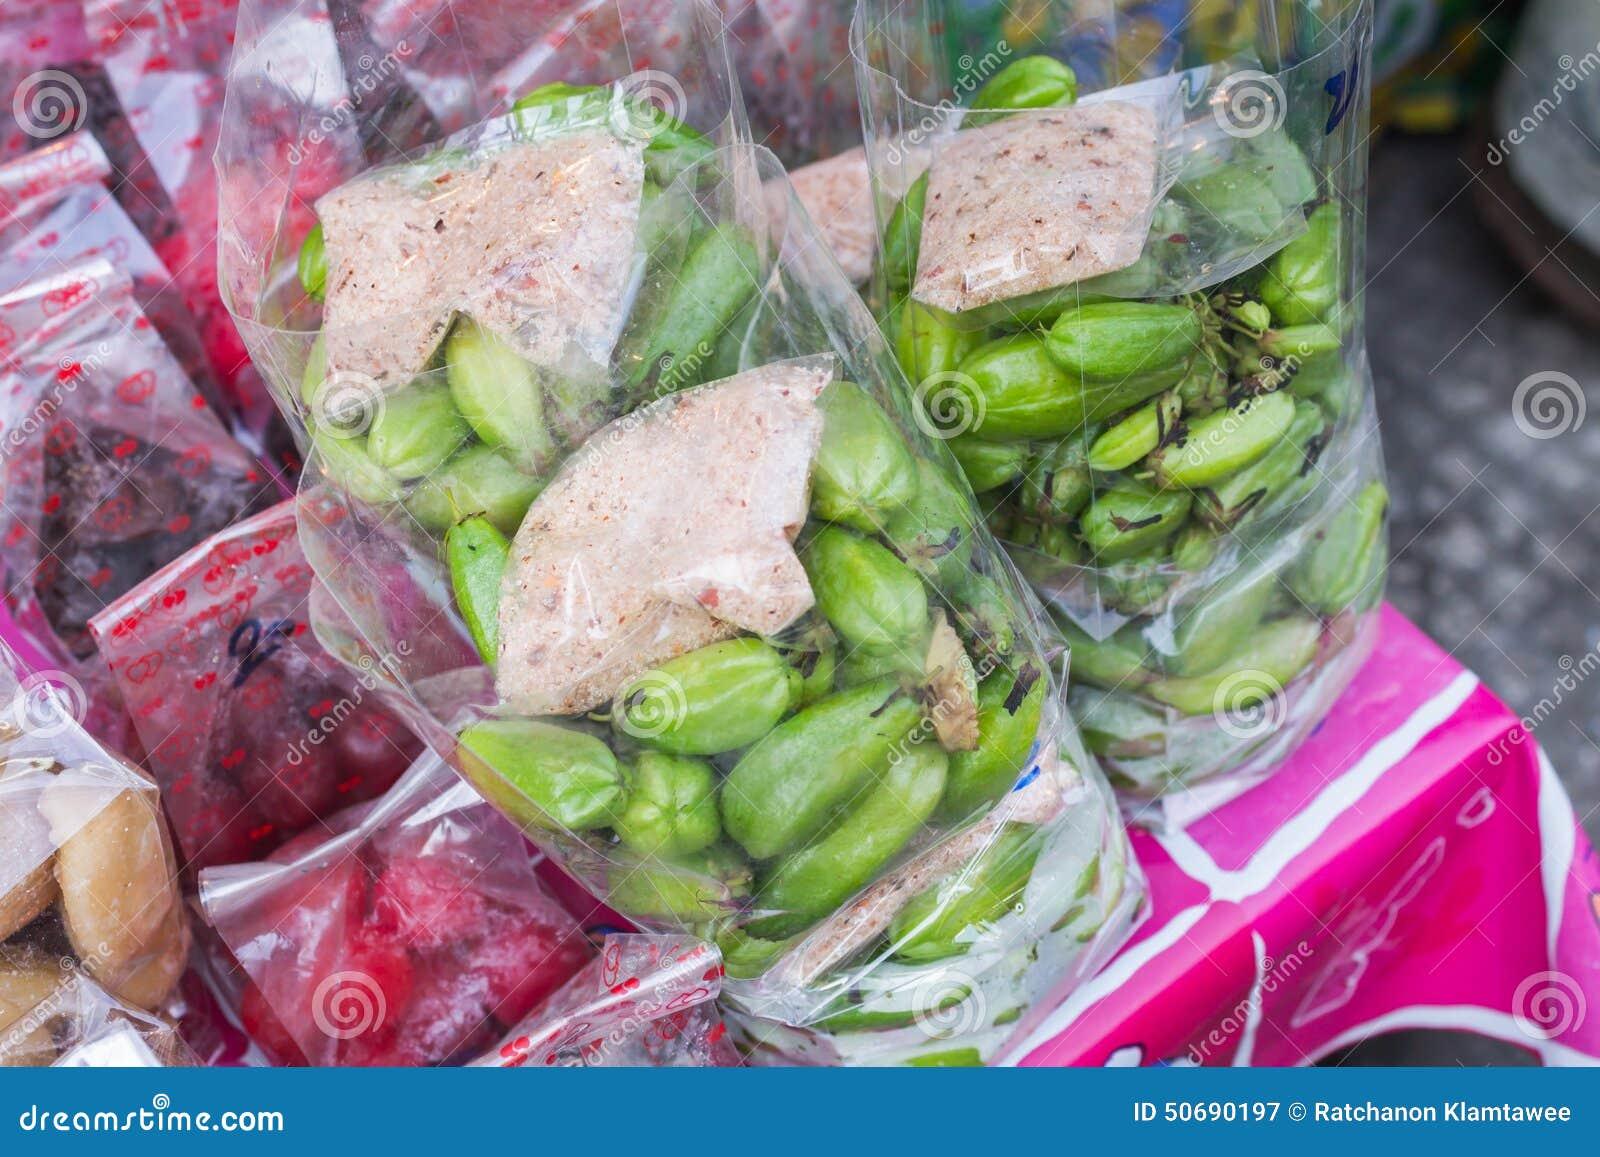 Download Lemons lime 库存图片. 图片 包括有 生气勃勃, 片式, 绿色, 查出, 飞行, 胡椒, 背包 - 50690197